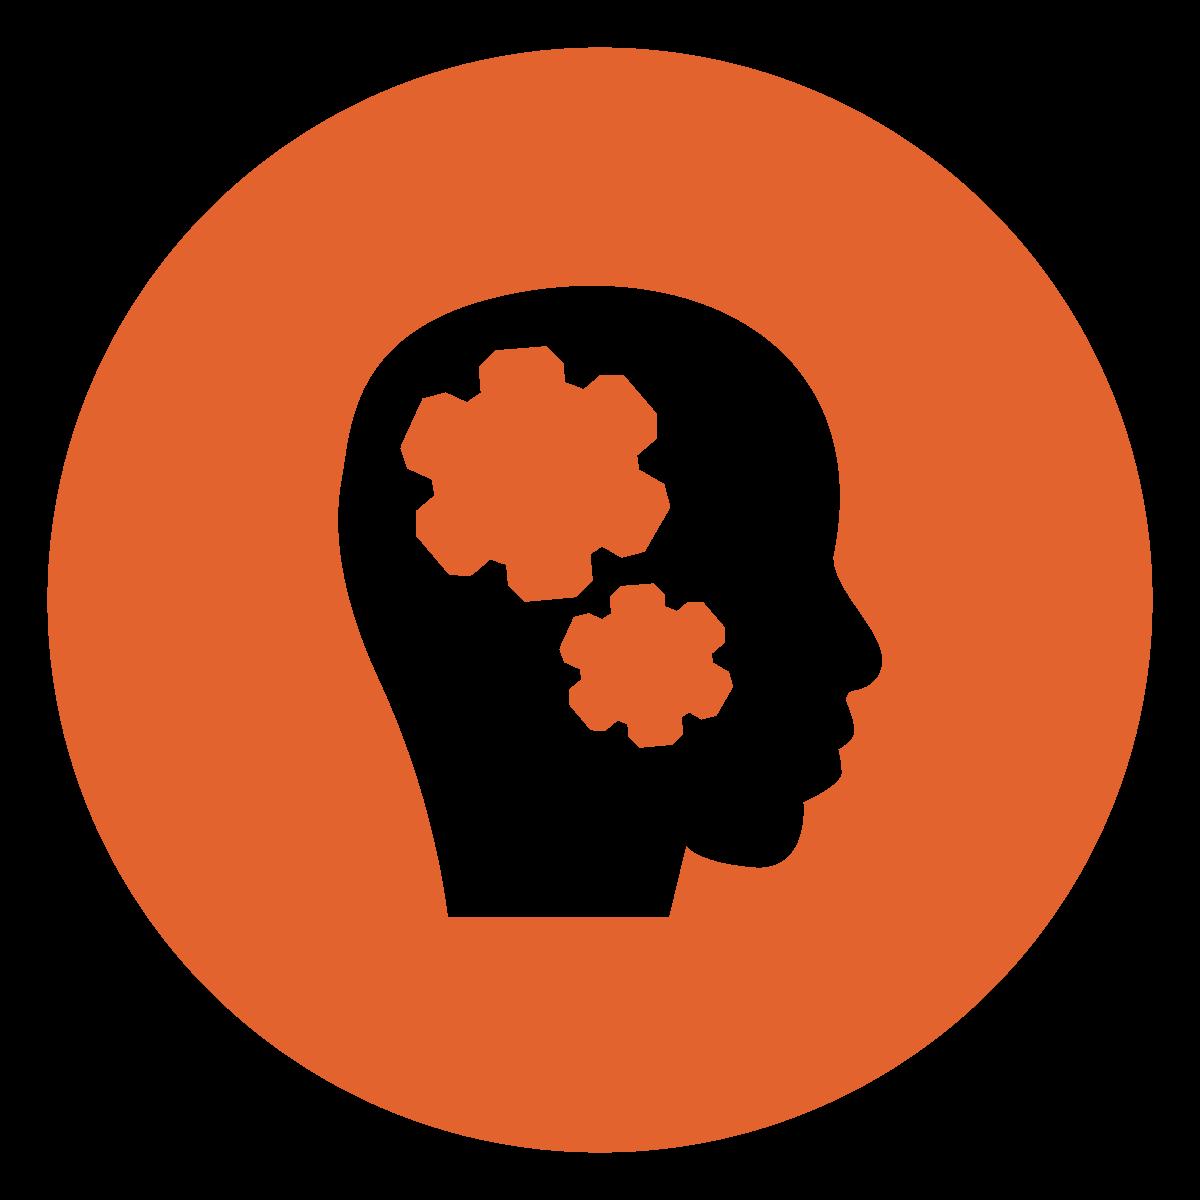 white silhouette profile of head with gears inside a dark orange circle